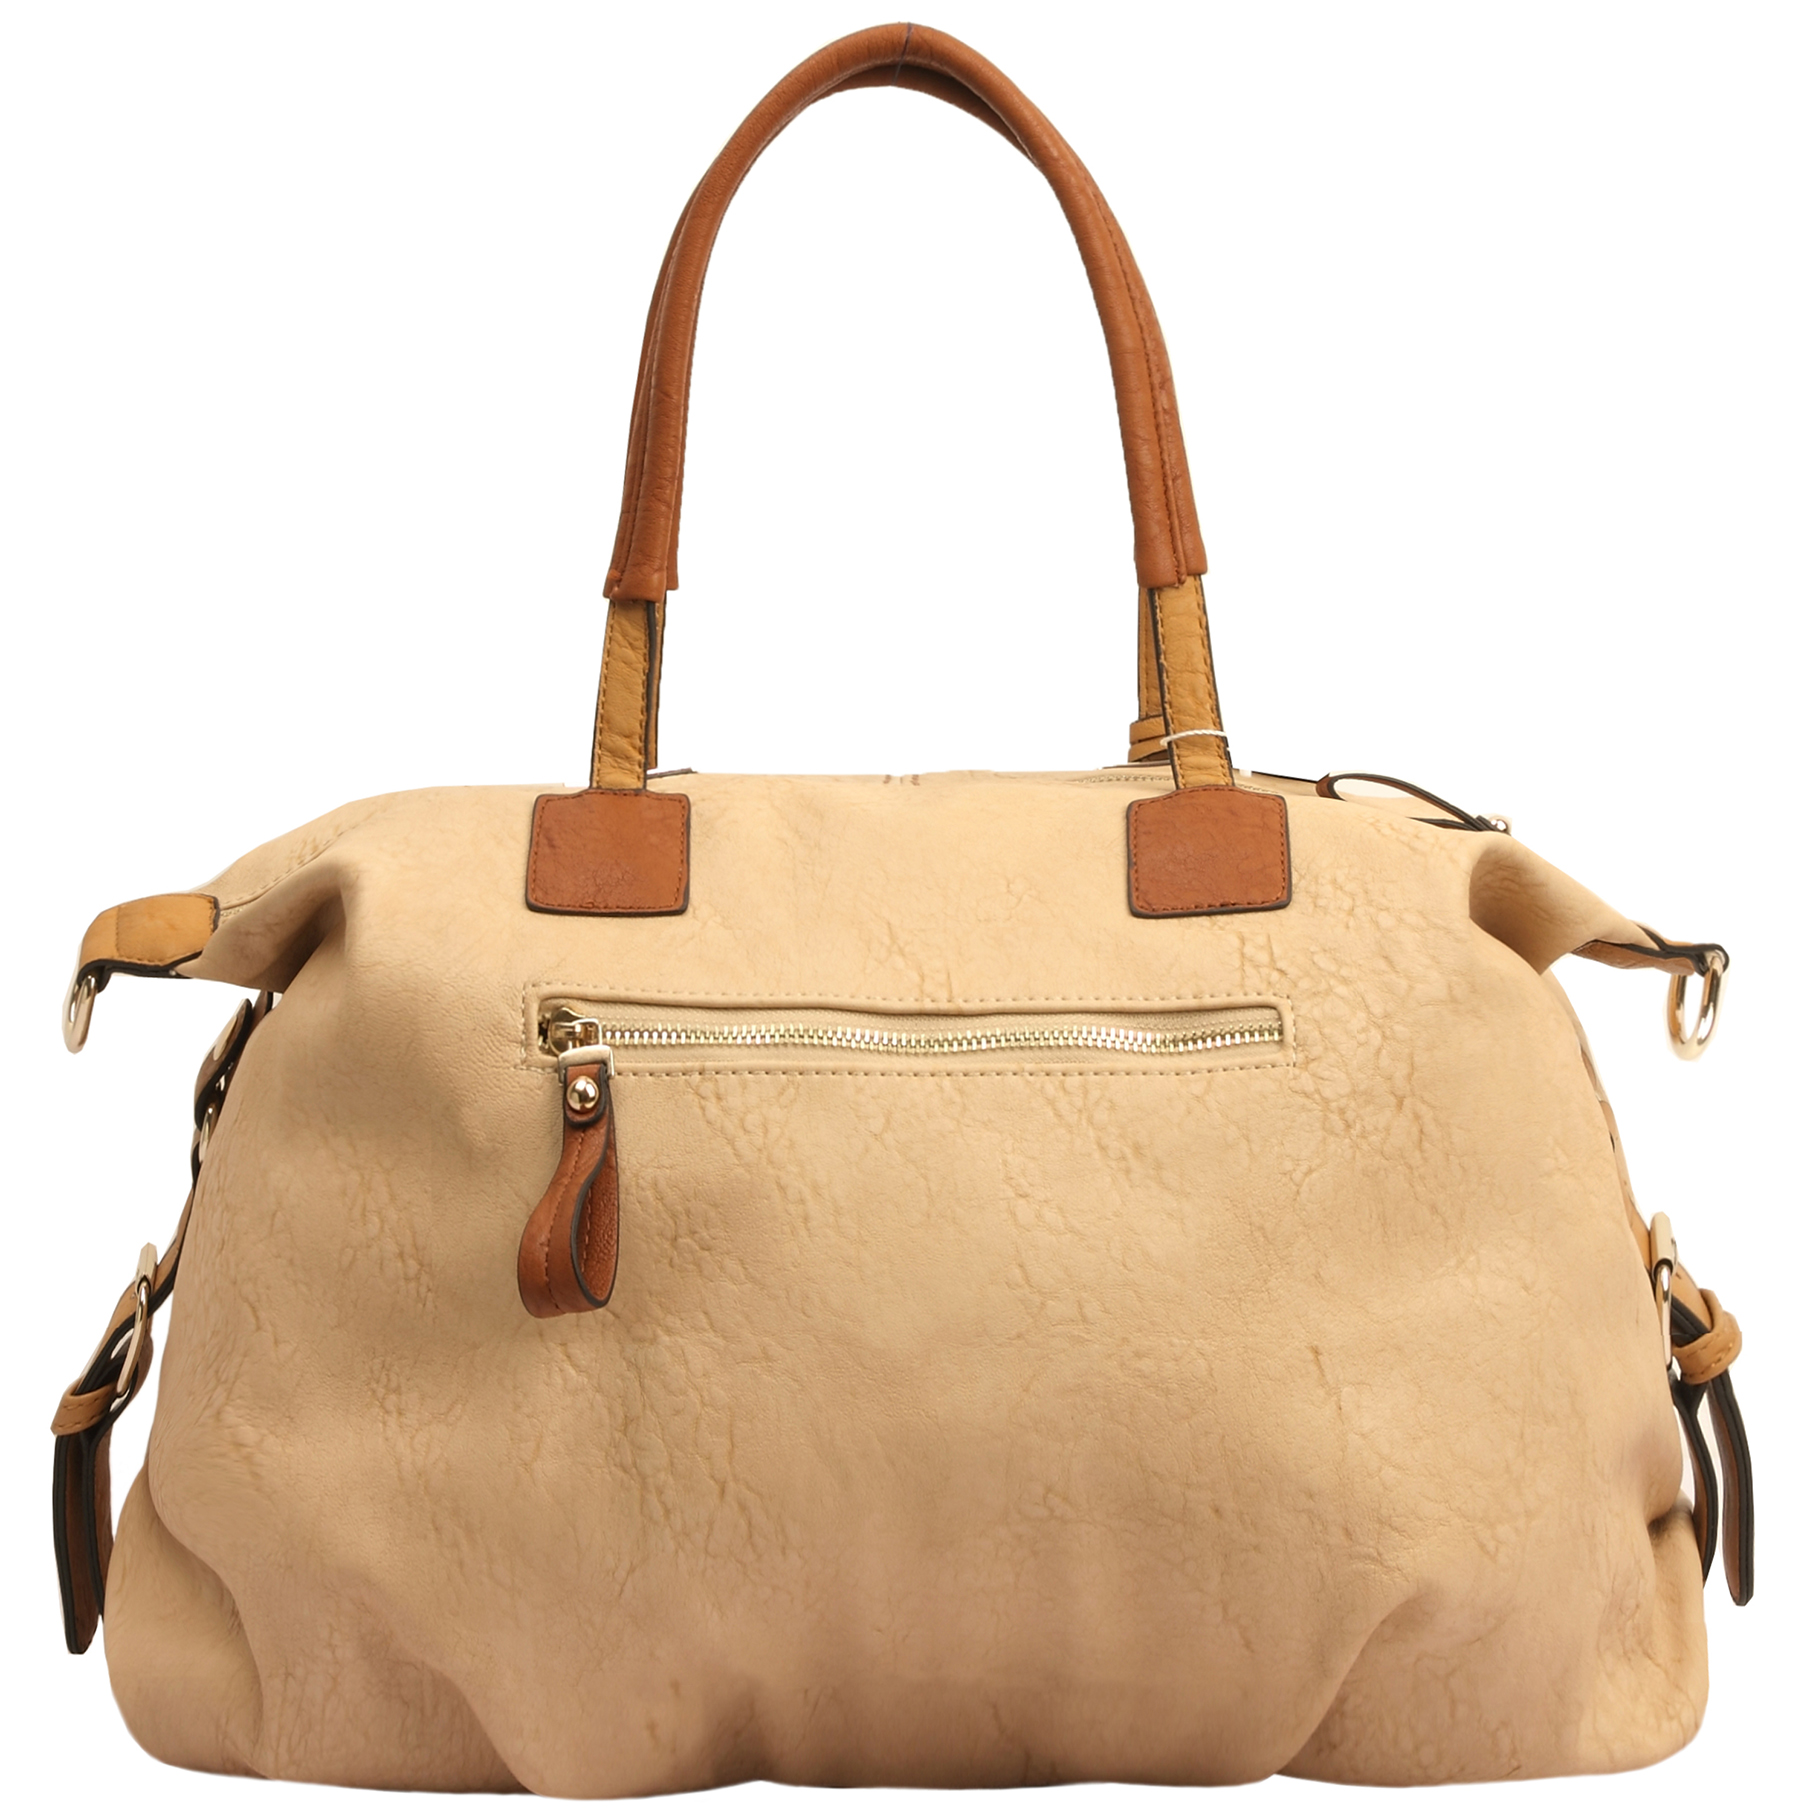 ACACIA Nude Large Everyday Shopper Hobo Handbag Back